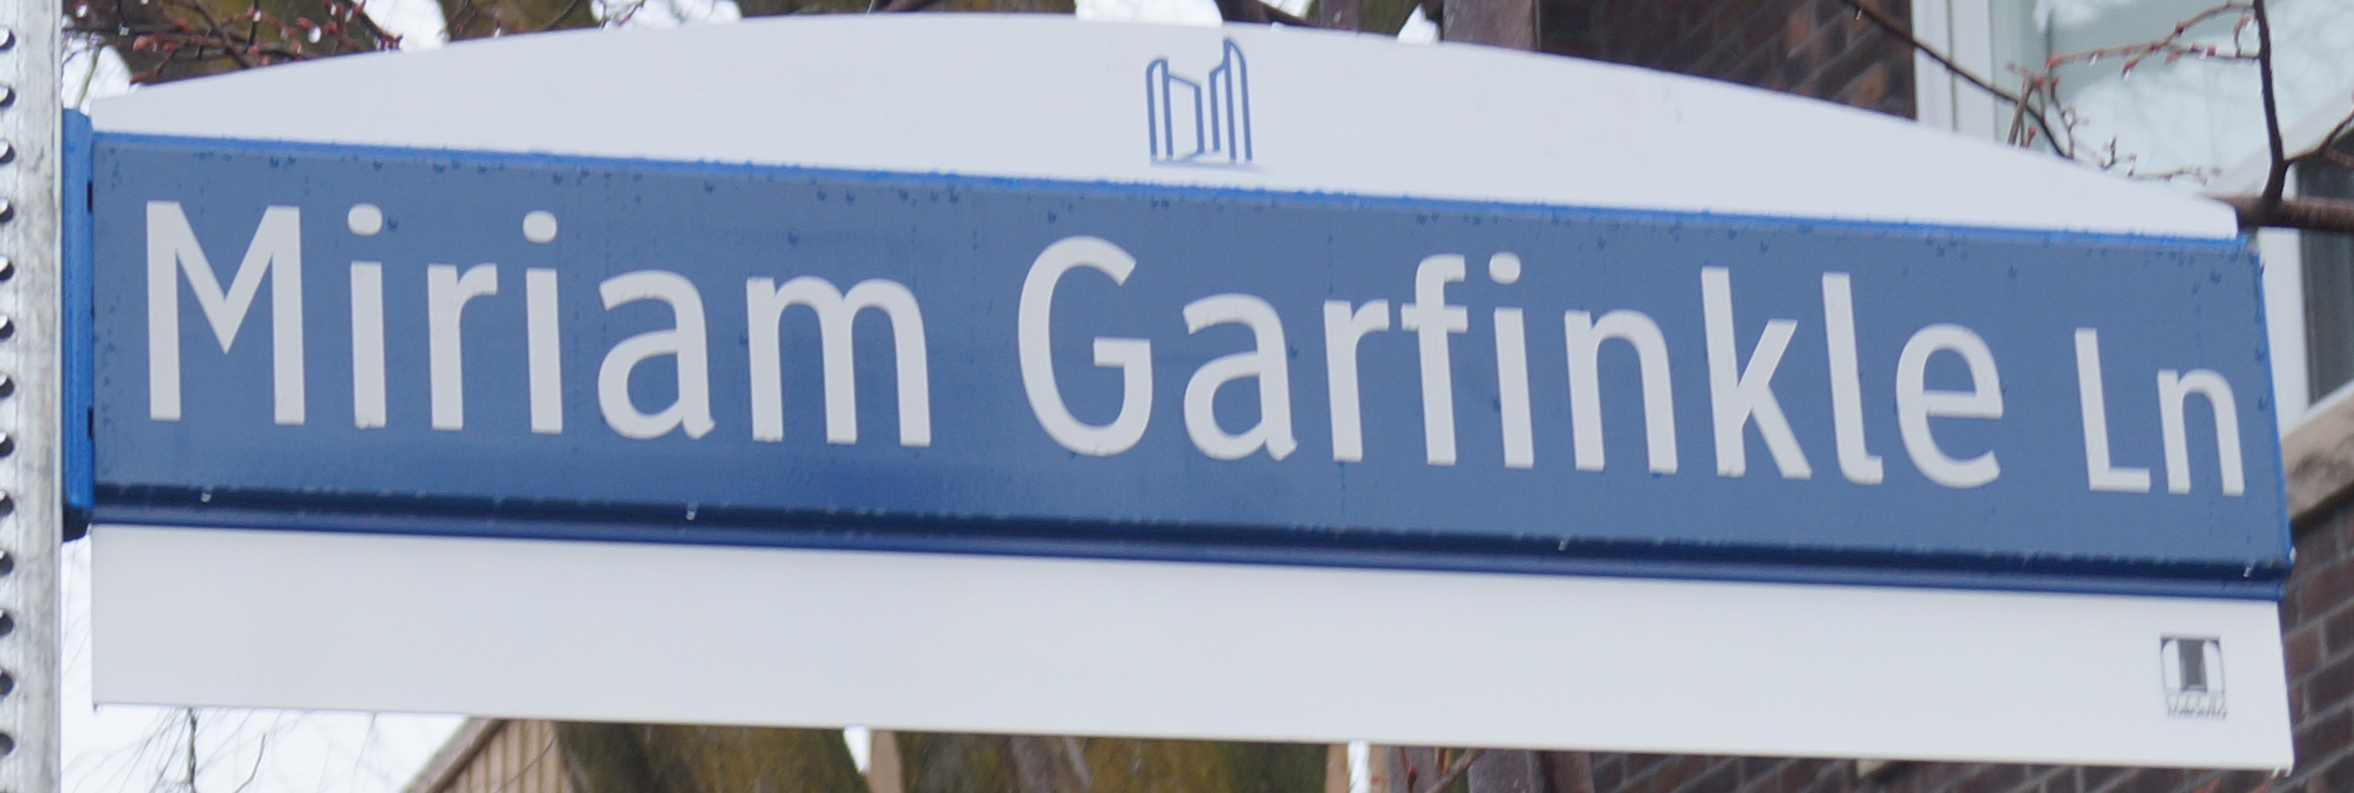 Miriam Garfinkle Lane sign